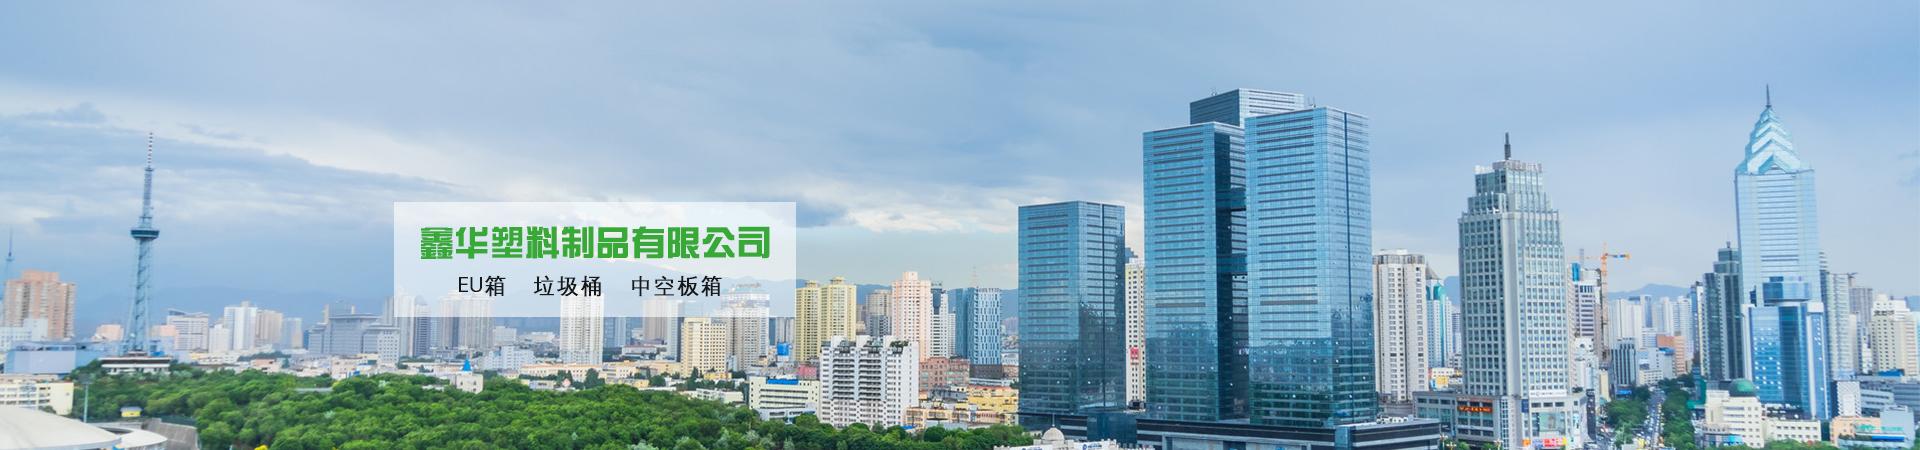 http://www.xinhuaslzp.com/data/upload/202009/20200922090111_822.jpg